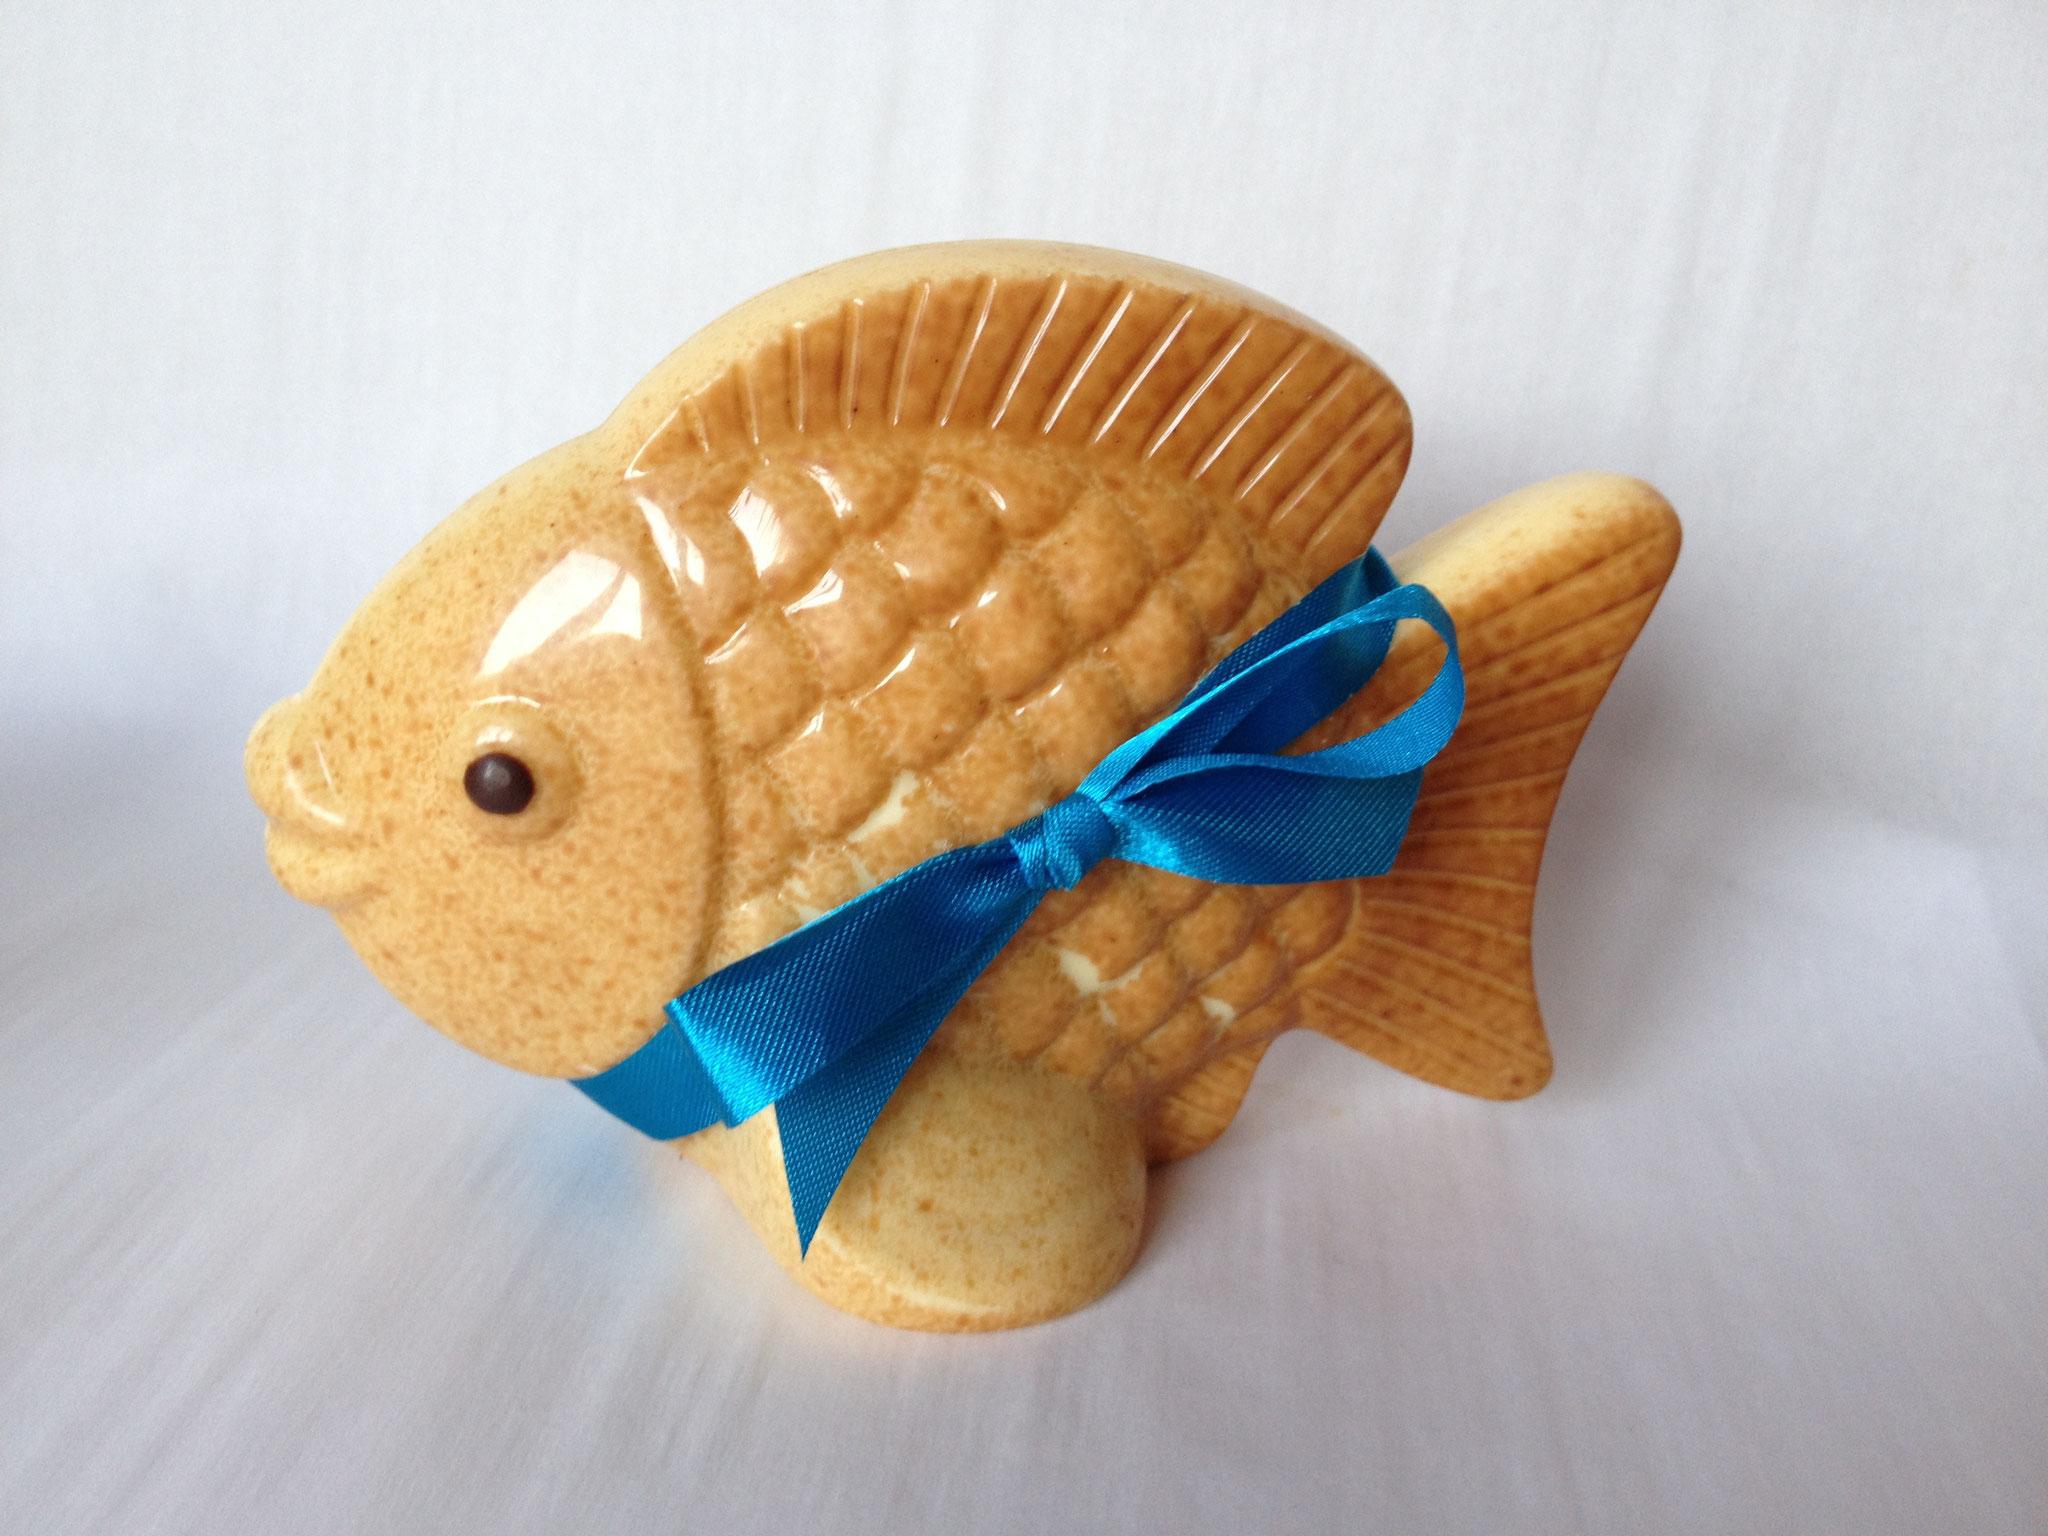 poisson plat 130g - 8.40€